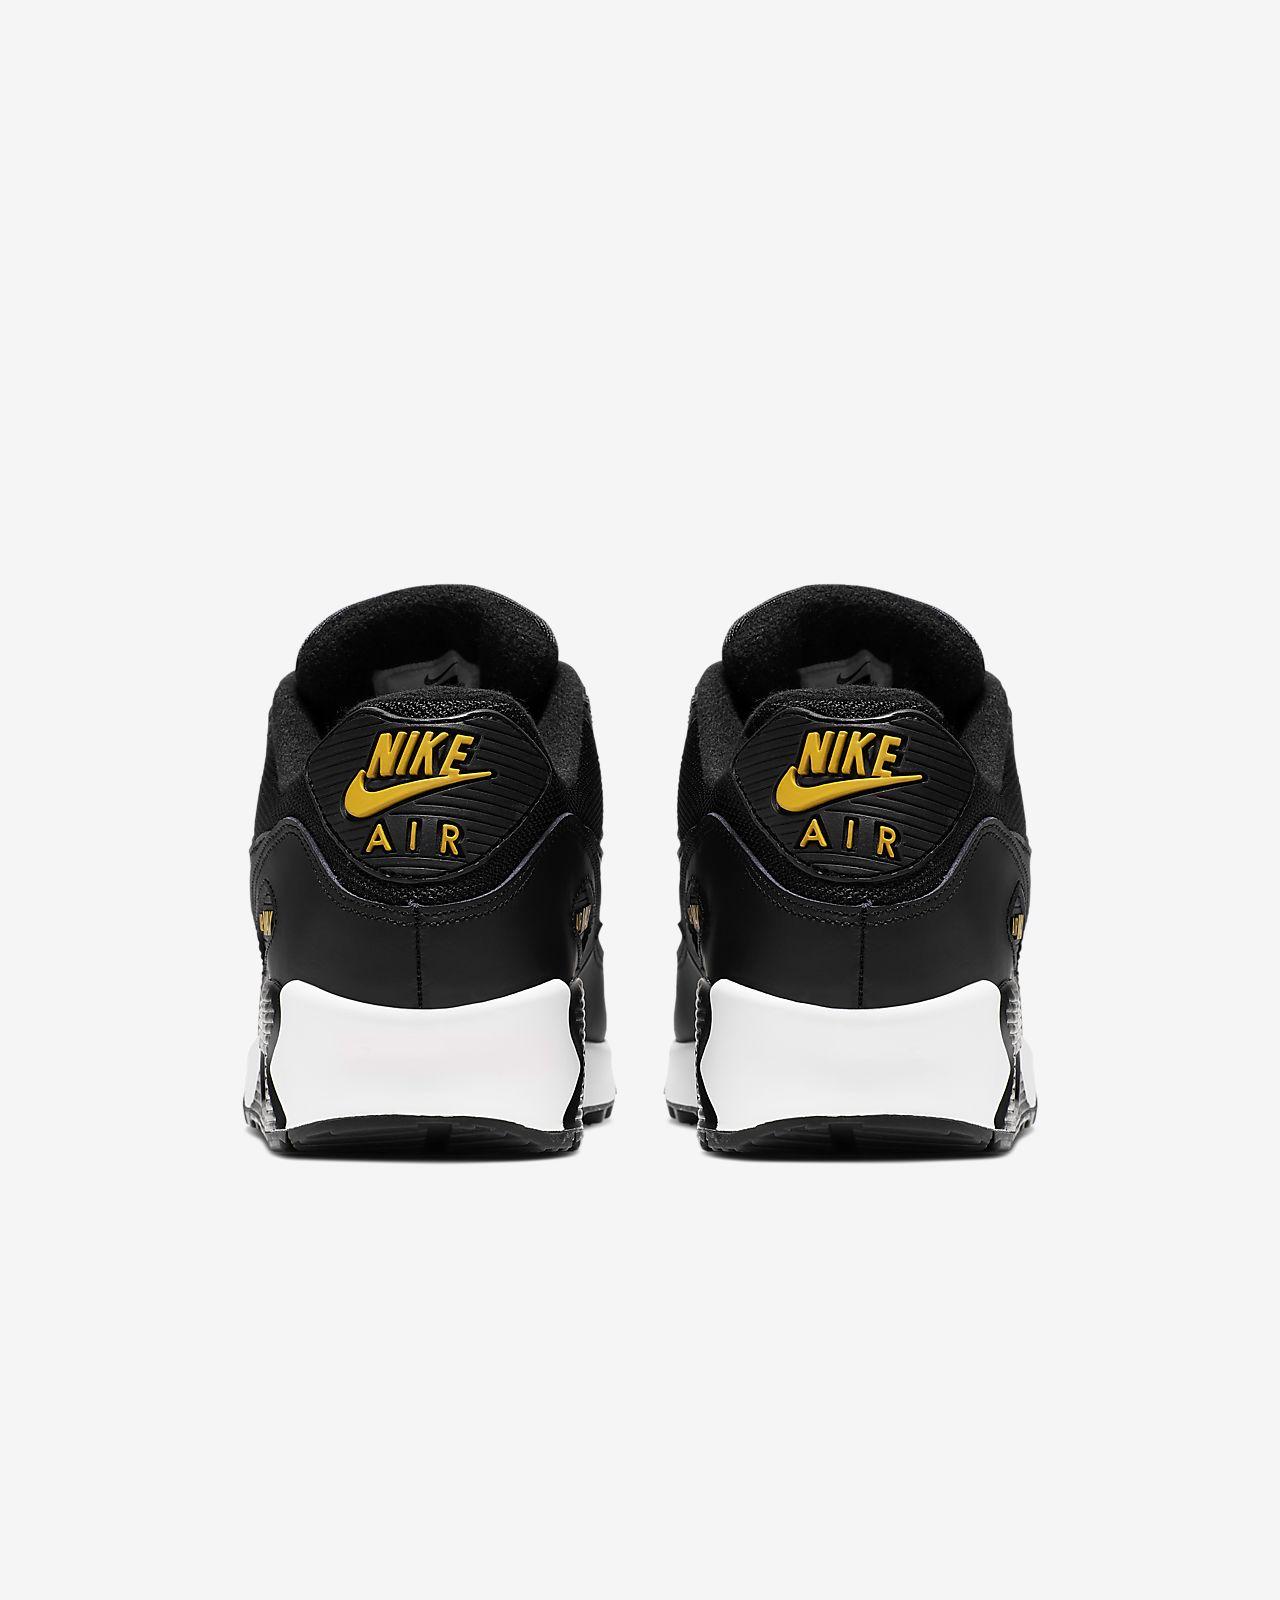 watch a48b1 1fbf7 Sneaker Nike Air Max 90 Essential Uk 9 Light Bone Sport Turquoise Bnib Mens  Trainers